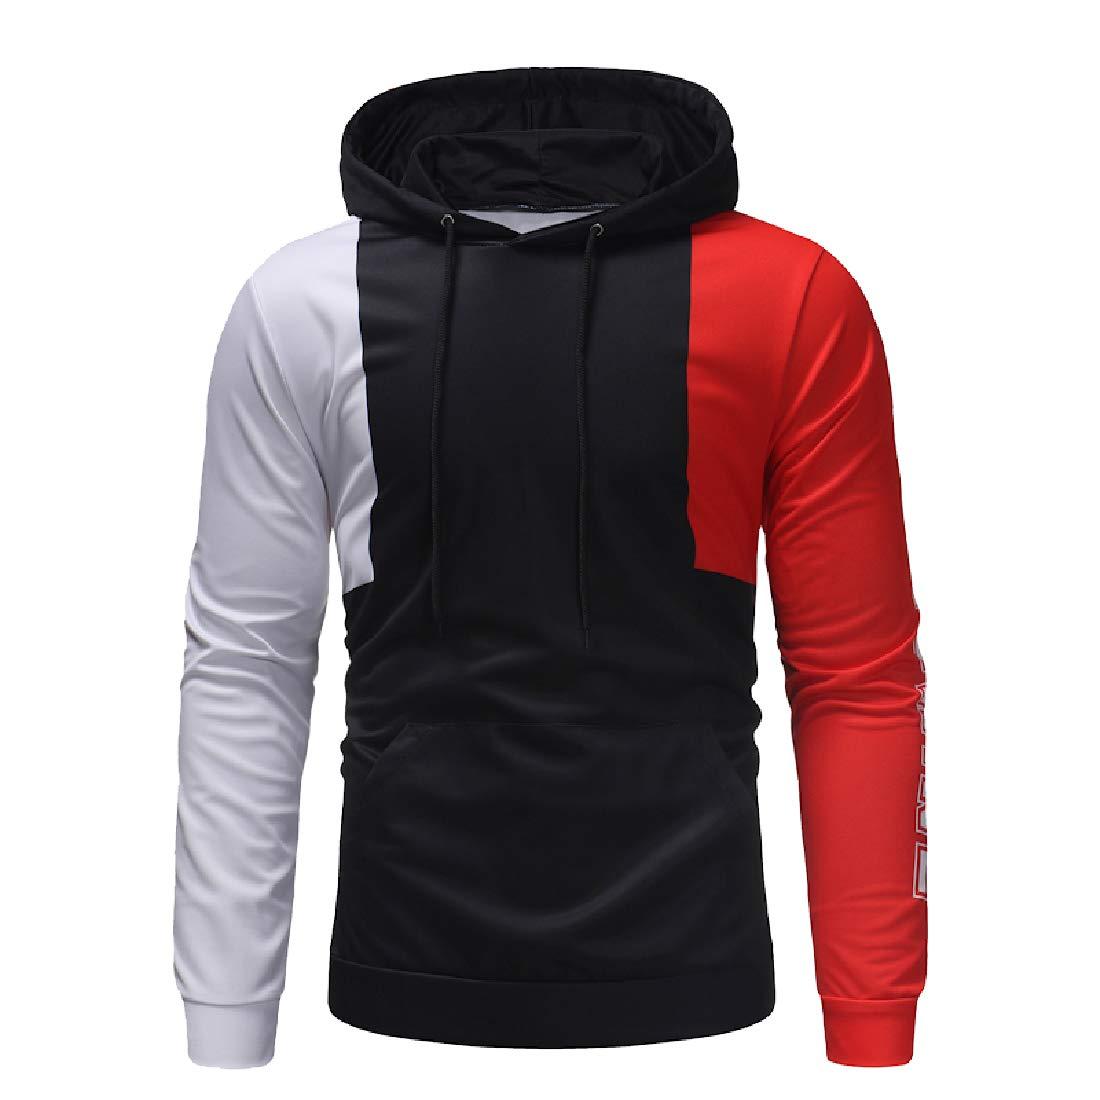 YUNY Men Fall Winter Contrast Casual Athletic Long-Sleeve Sweatshirt Red 2XL